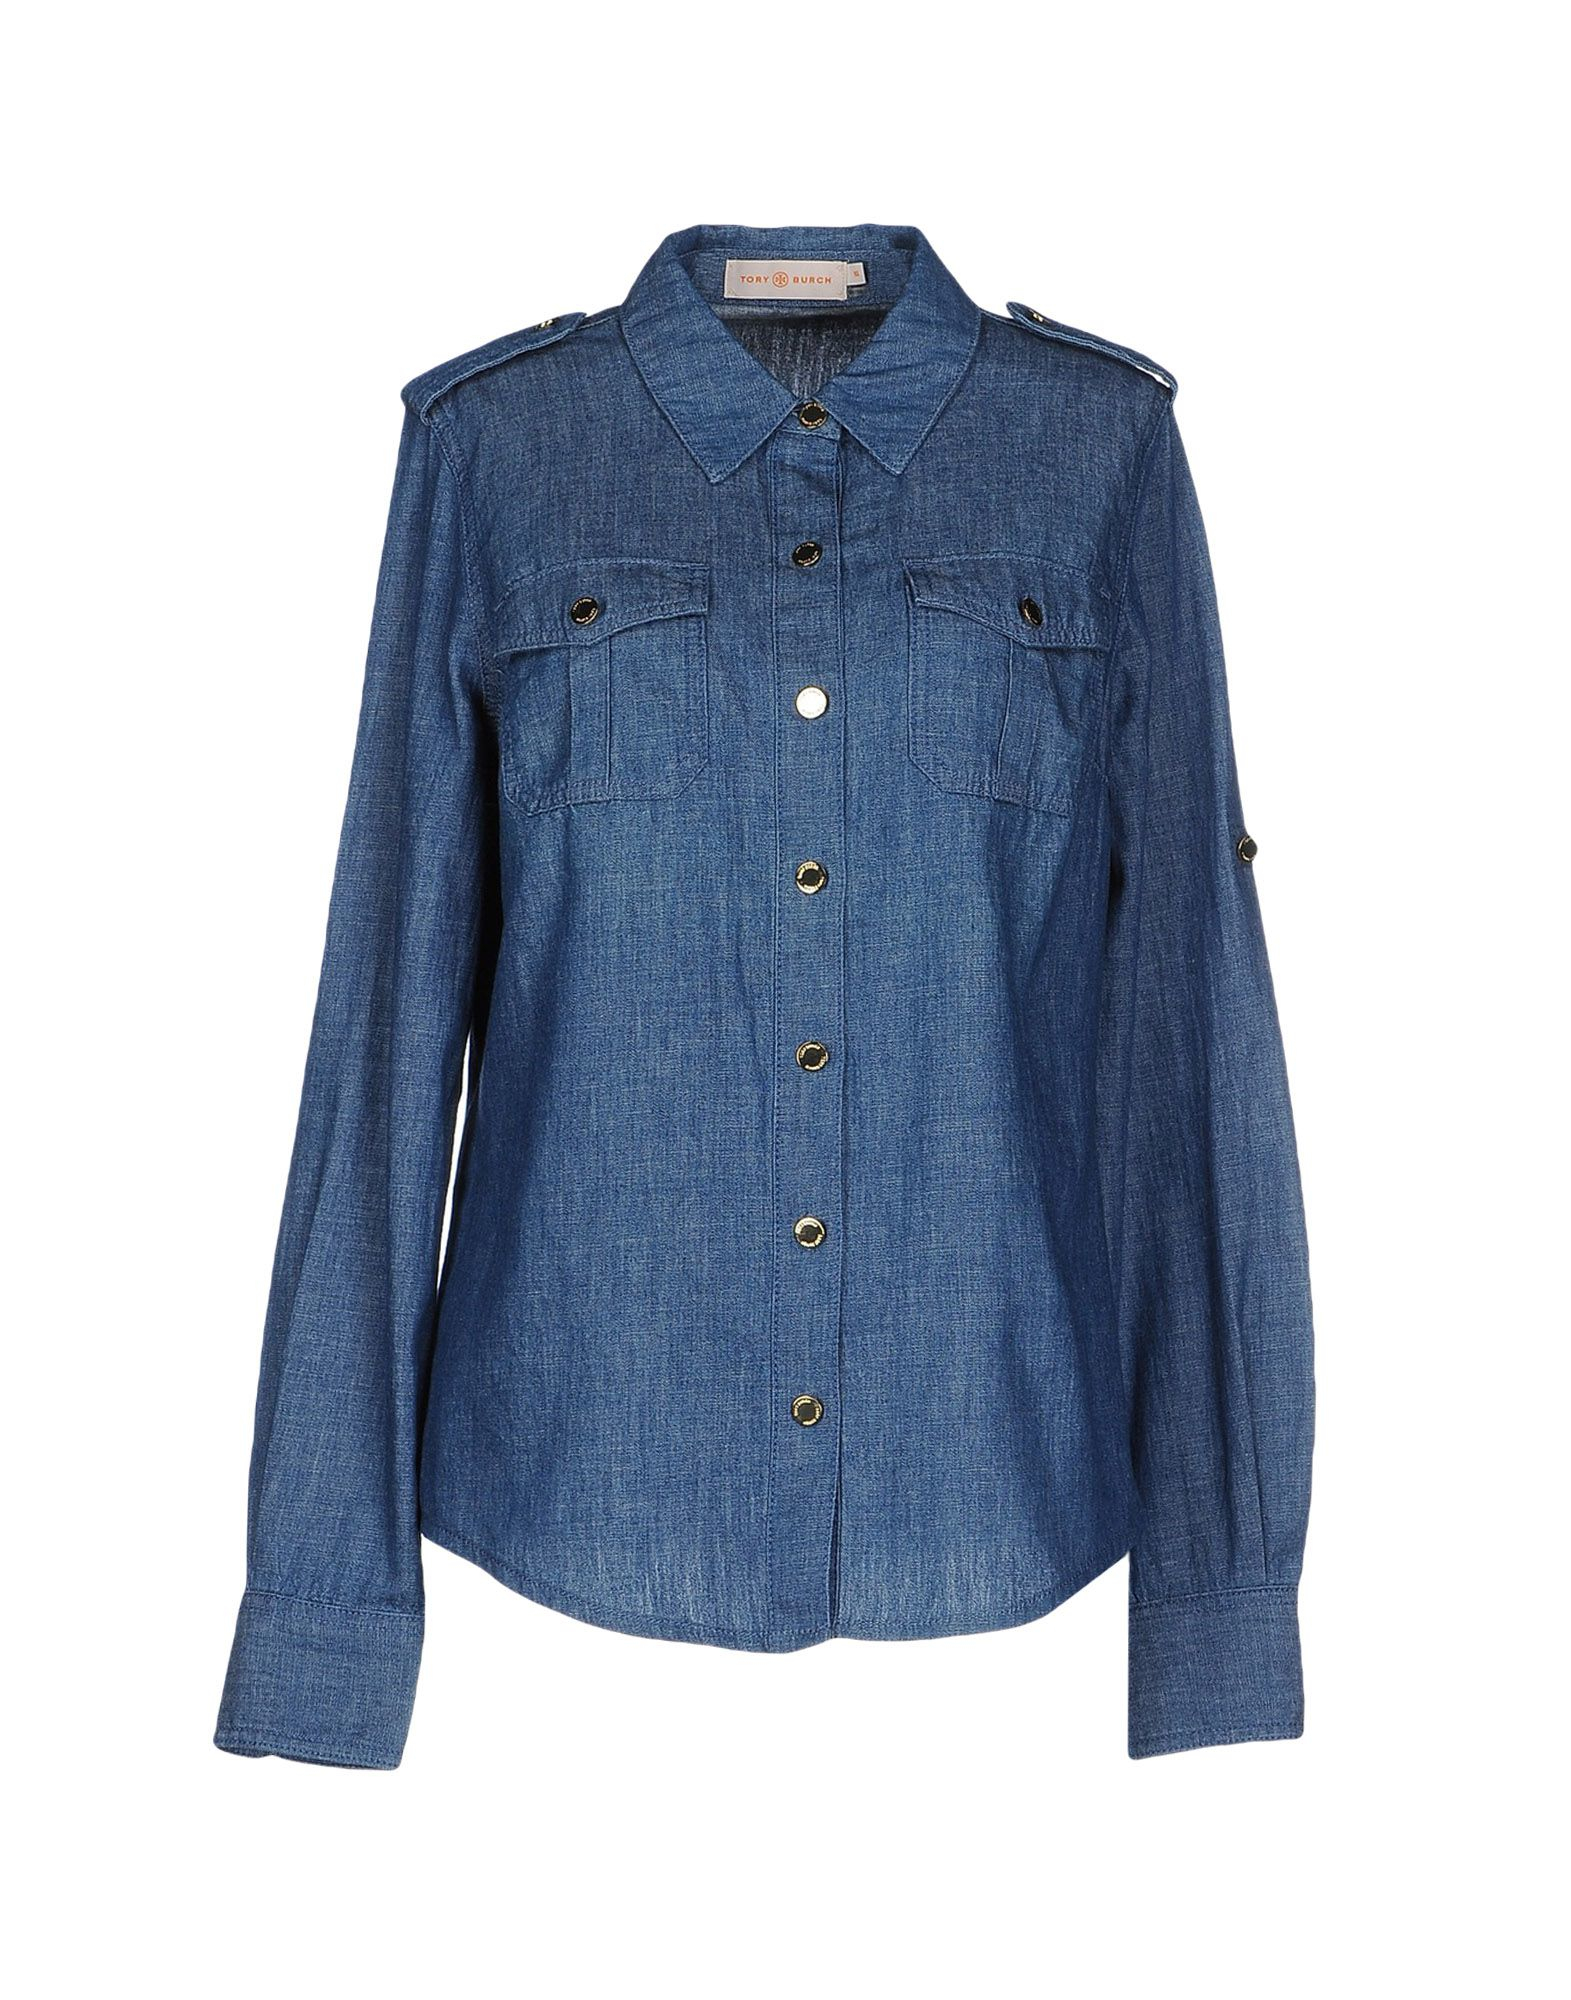 Lyst Tory Burch Denim Shirt In Blue